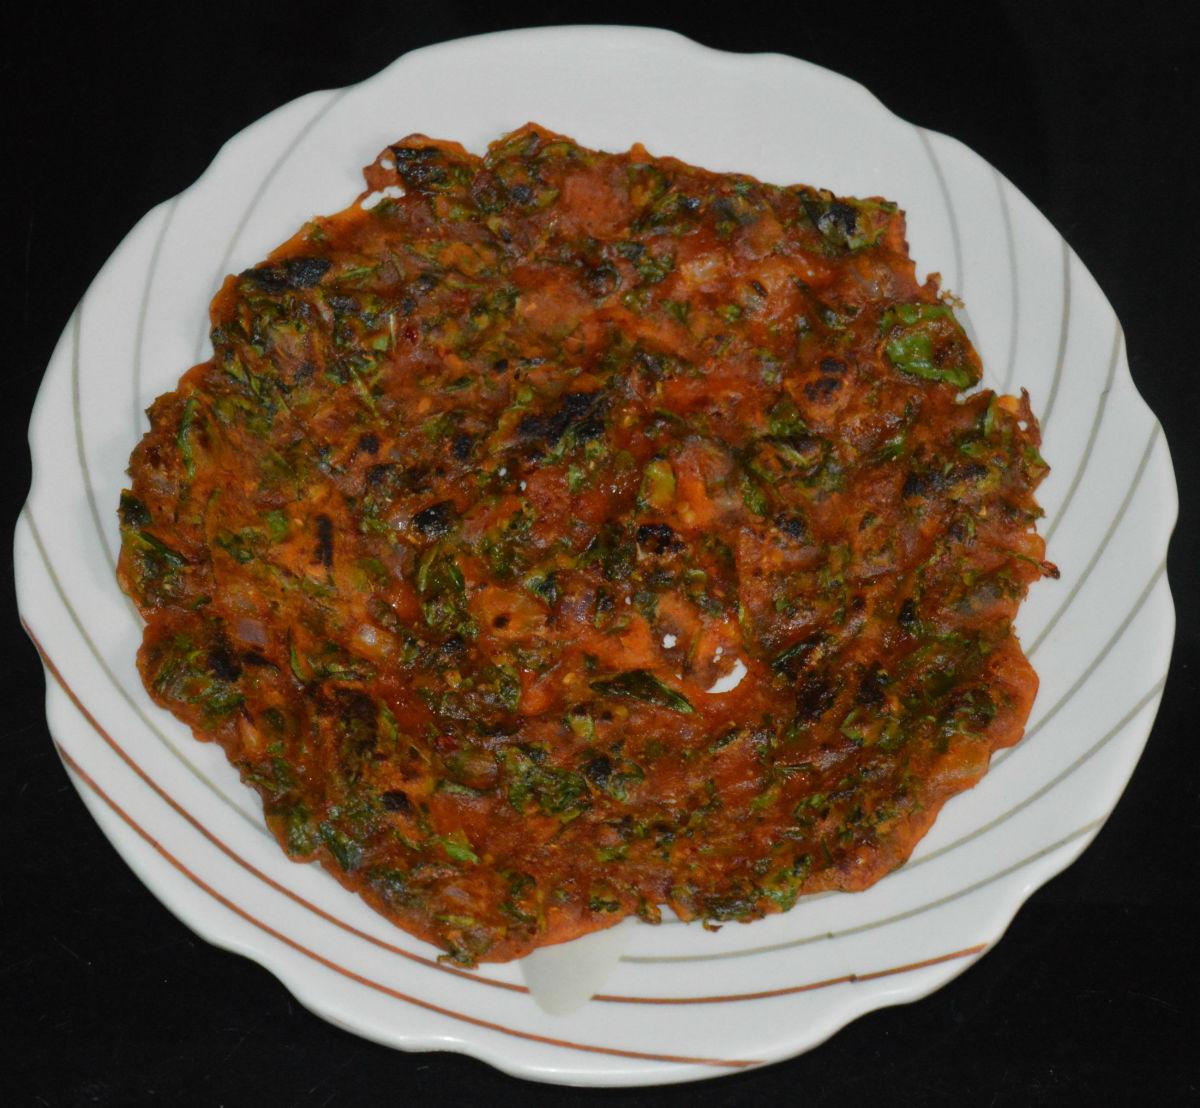 How to Make Spicy Fenugreek Leaf Pancake (Methi Roti)